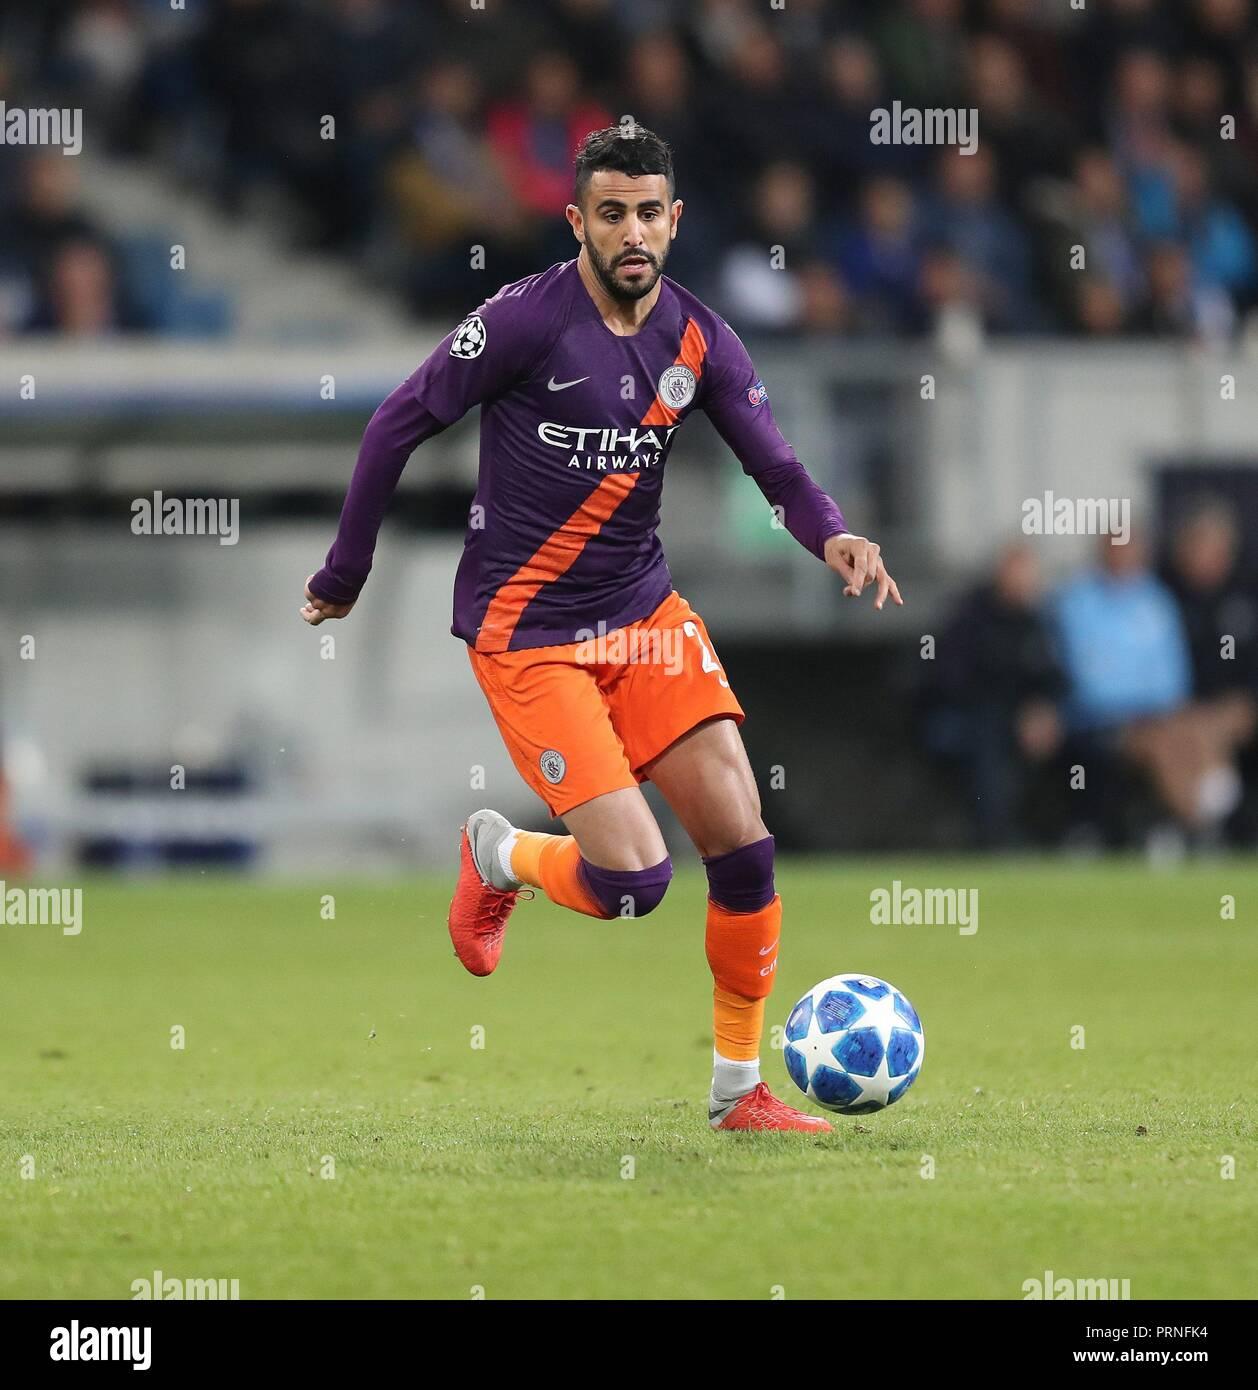 firo: 02.10.2018 Football, Football, Champions League: TSG Hoffenheim - Manchester City 1: 2 single action, Riyad Mahrez   usage worldwide - Stock Image